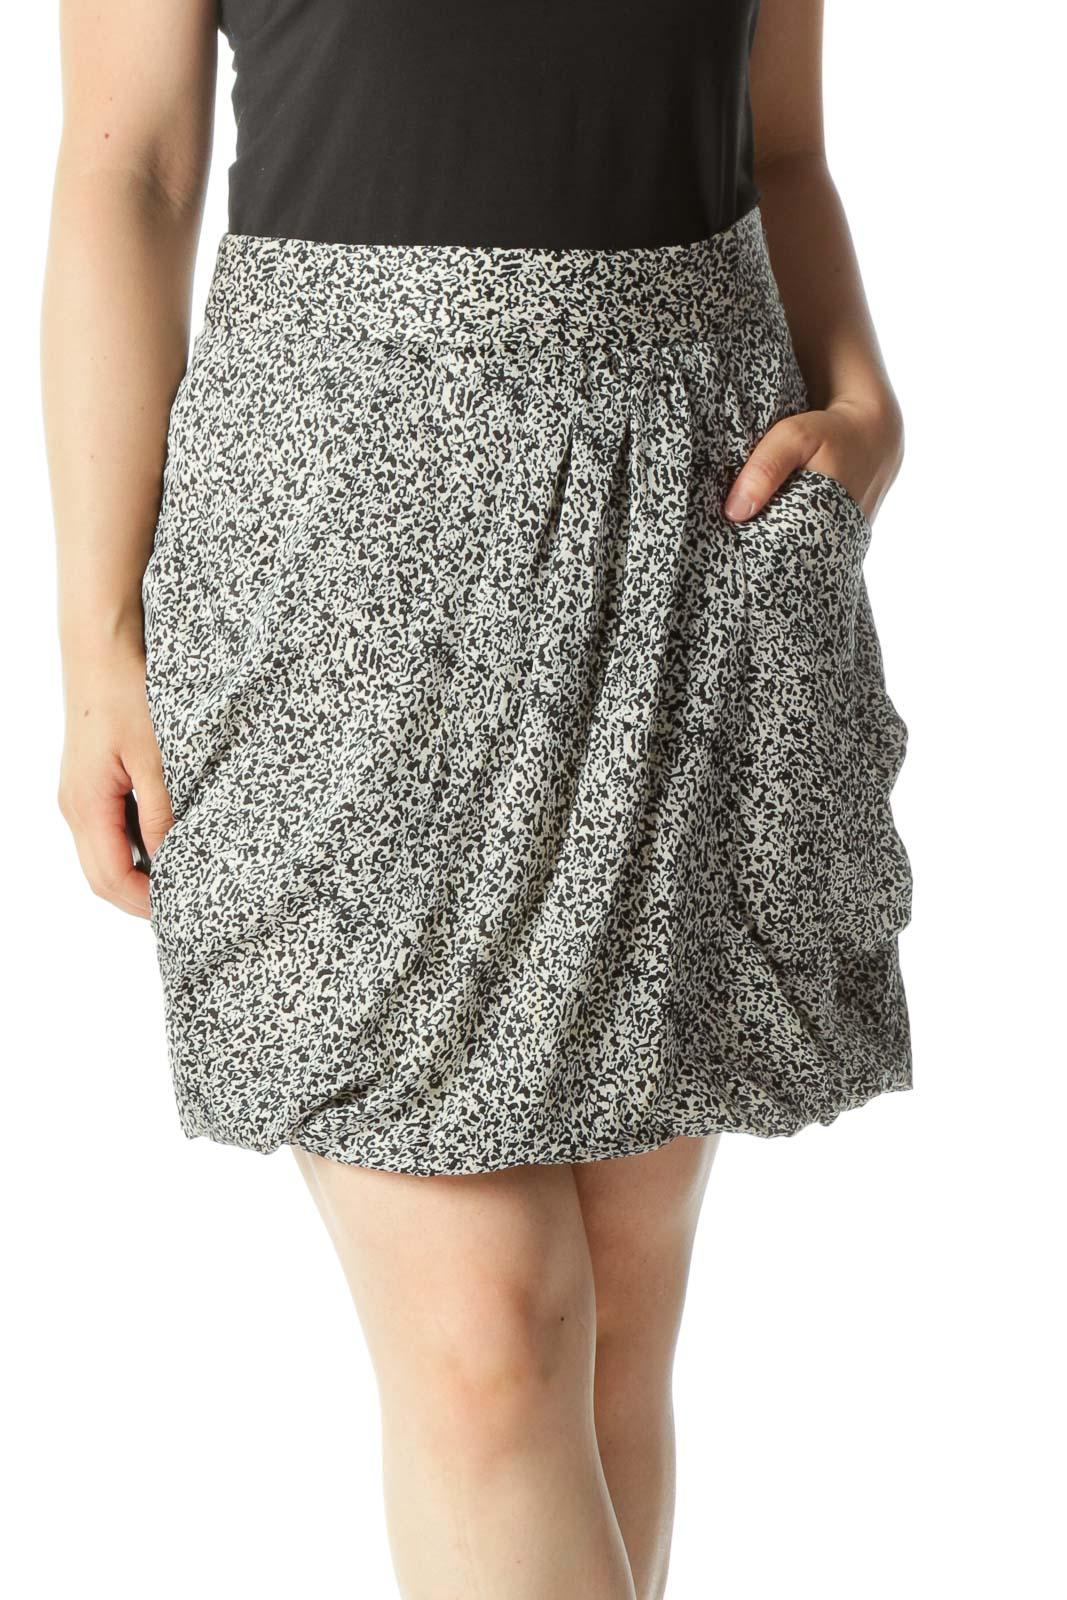 Black Cream Print Pocketed Pleated Pouf Wrap-Design Lightweight-Pouf Soft Skirt